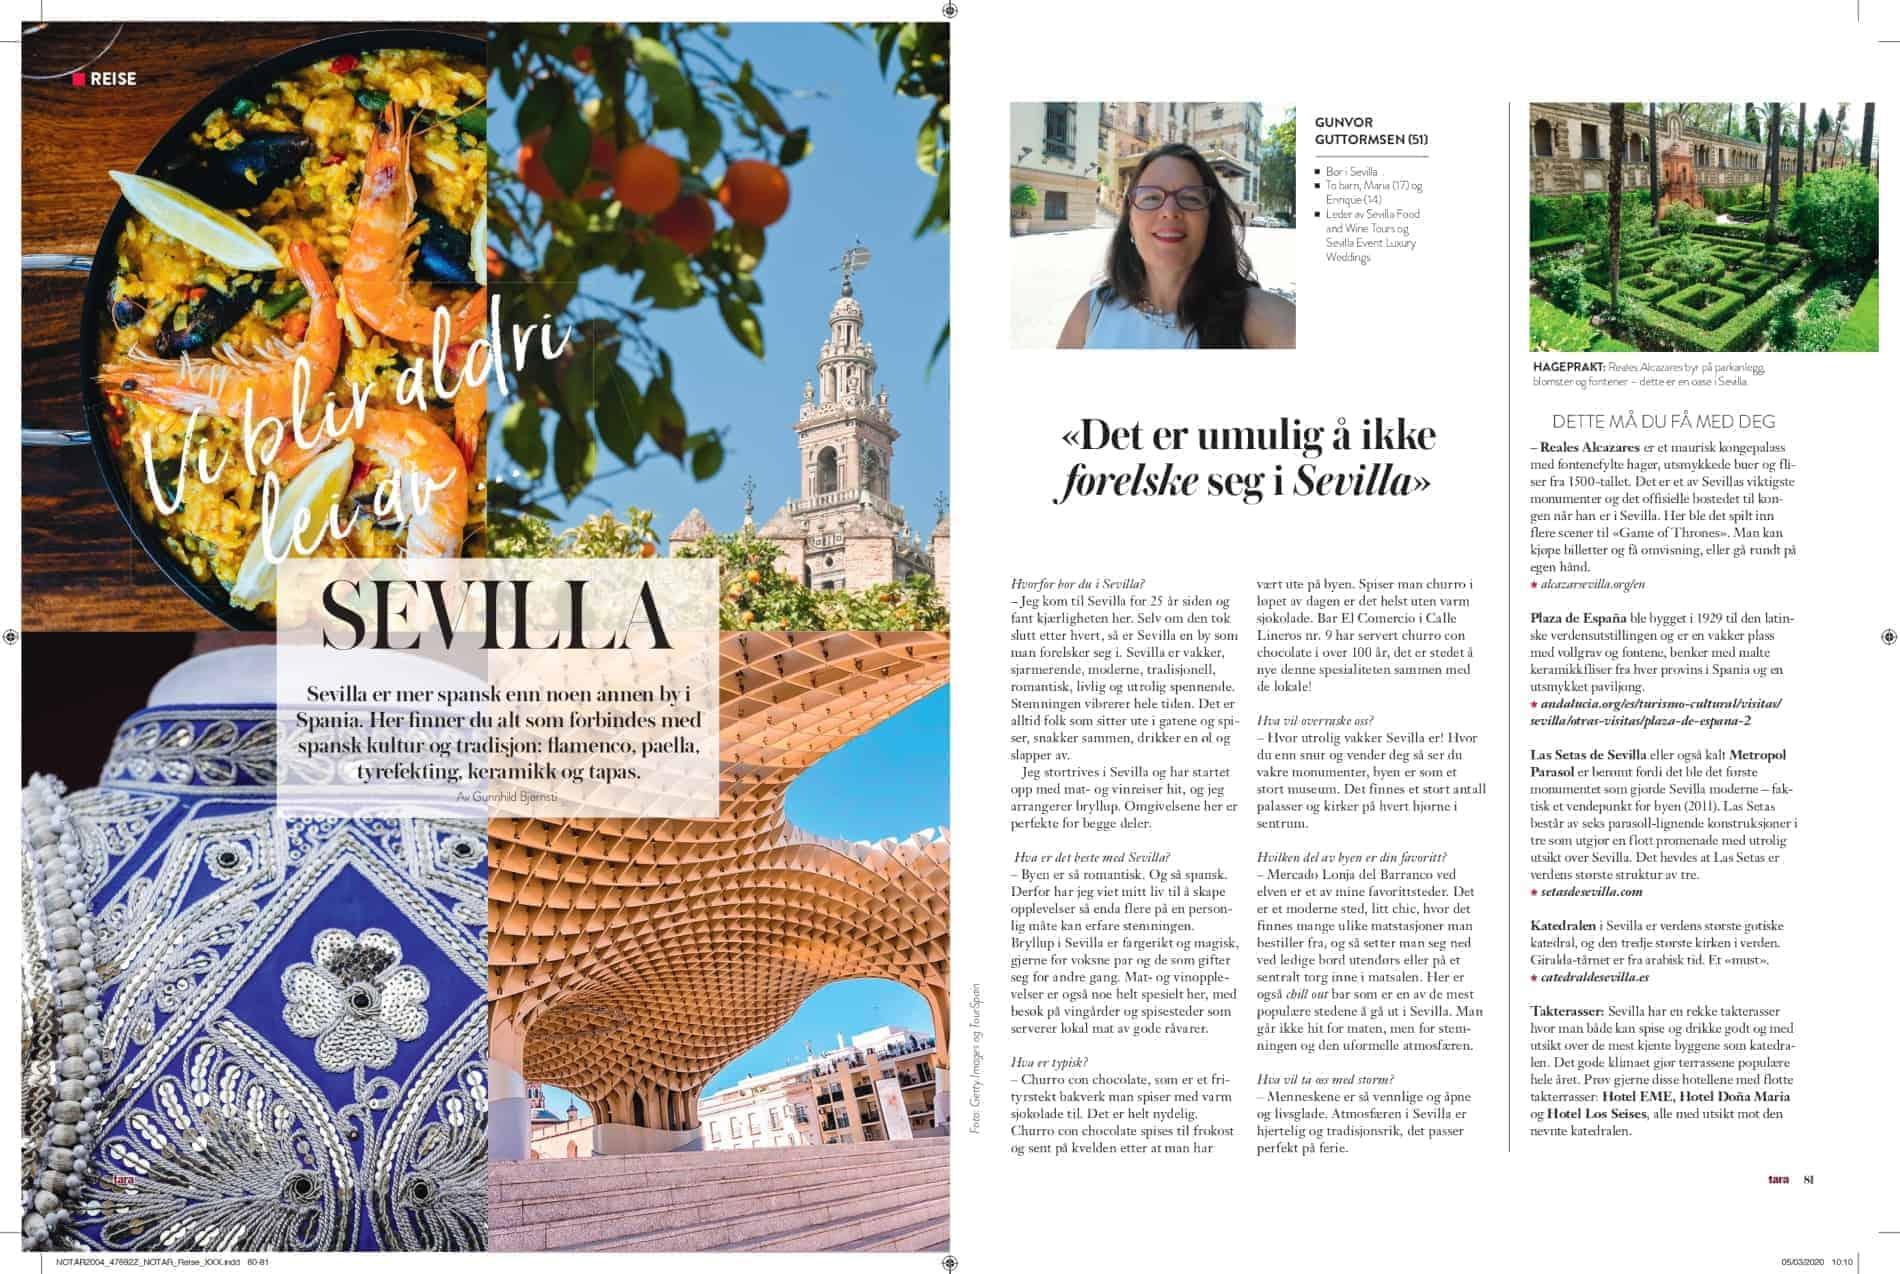 Reiseartikkel i Magasinet Tara om Sevilla med ulike bilder av Sevilla